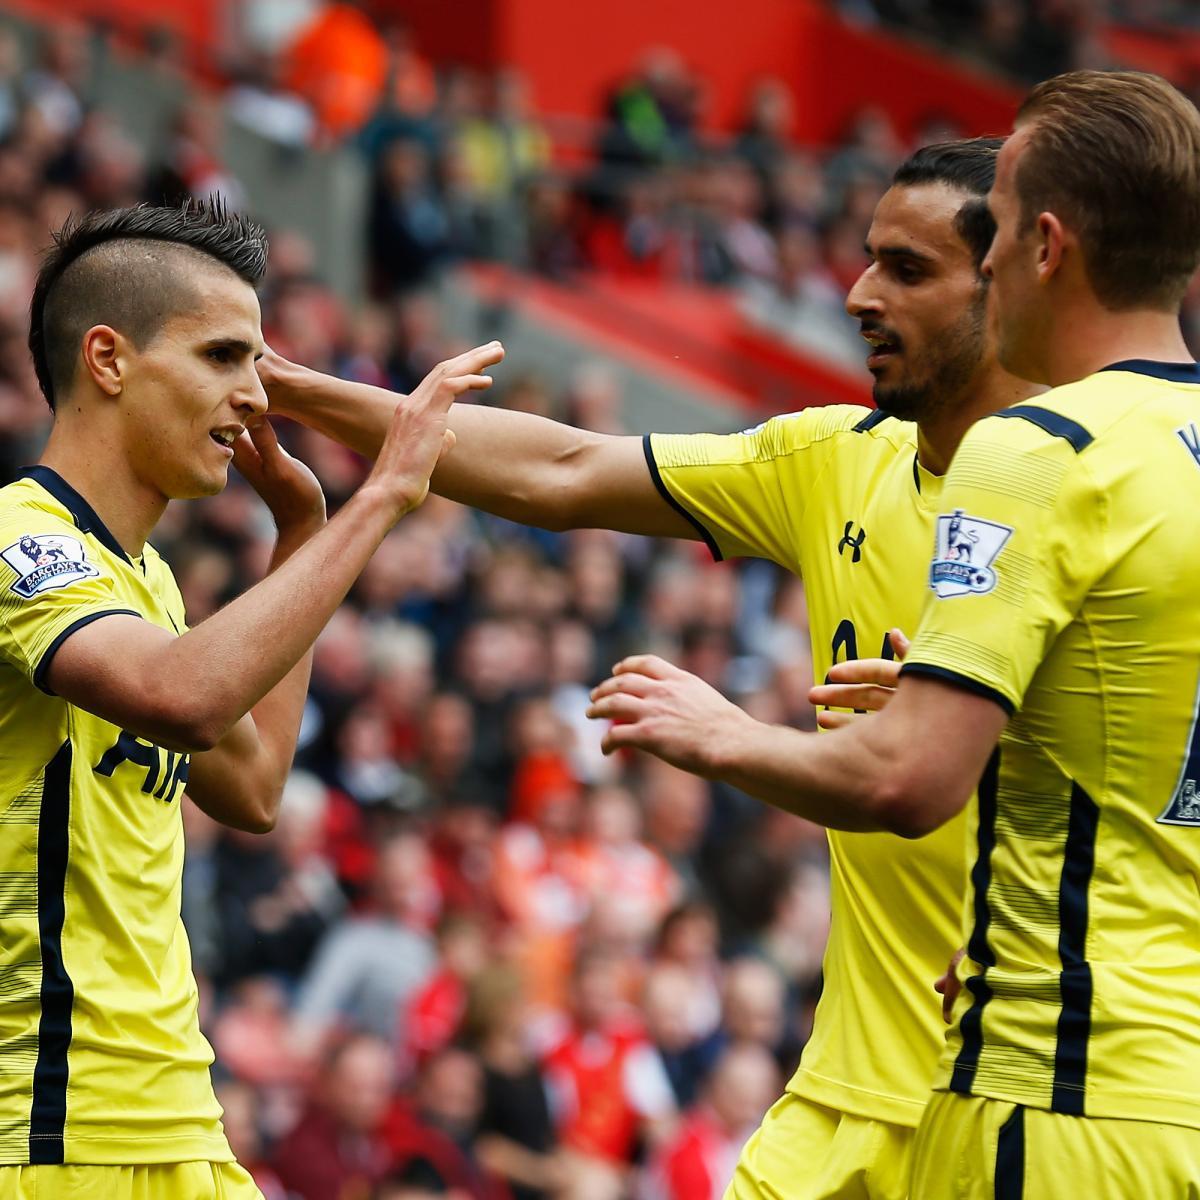 Tottenham 3 Fulham 1 Match Highlights Harry Kane Scores: Tottenham Hotspur: Ranking Best And Worst Spurs Players